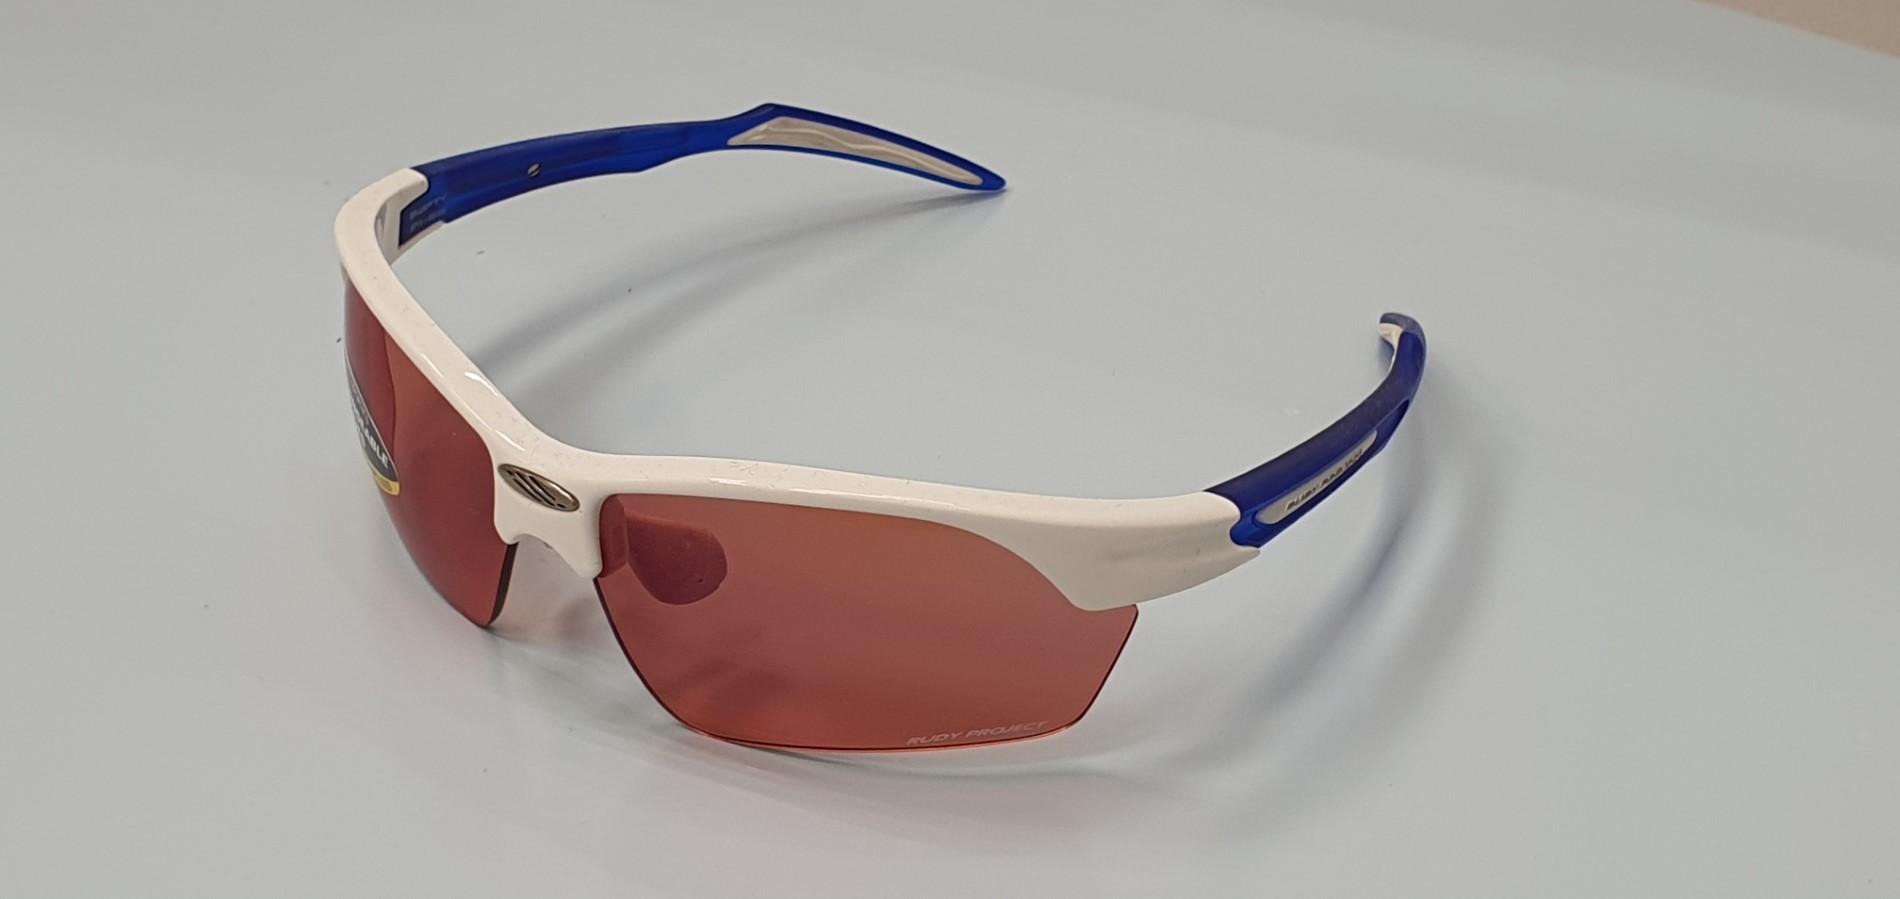 rudy project okulary śląsk